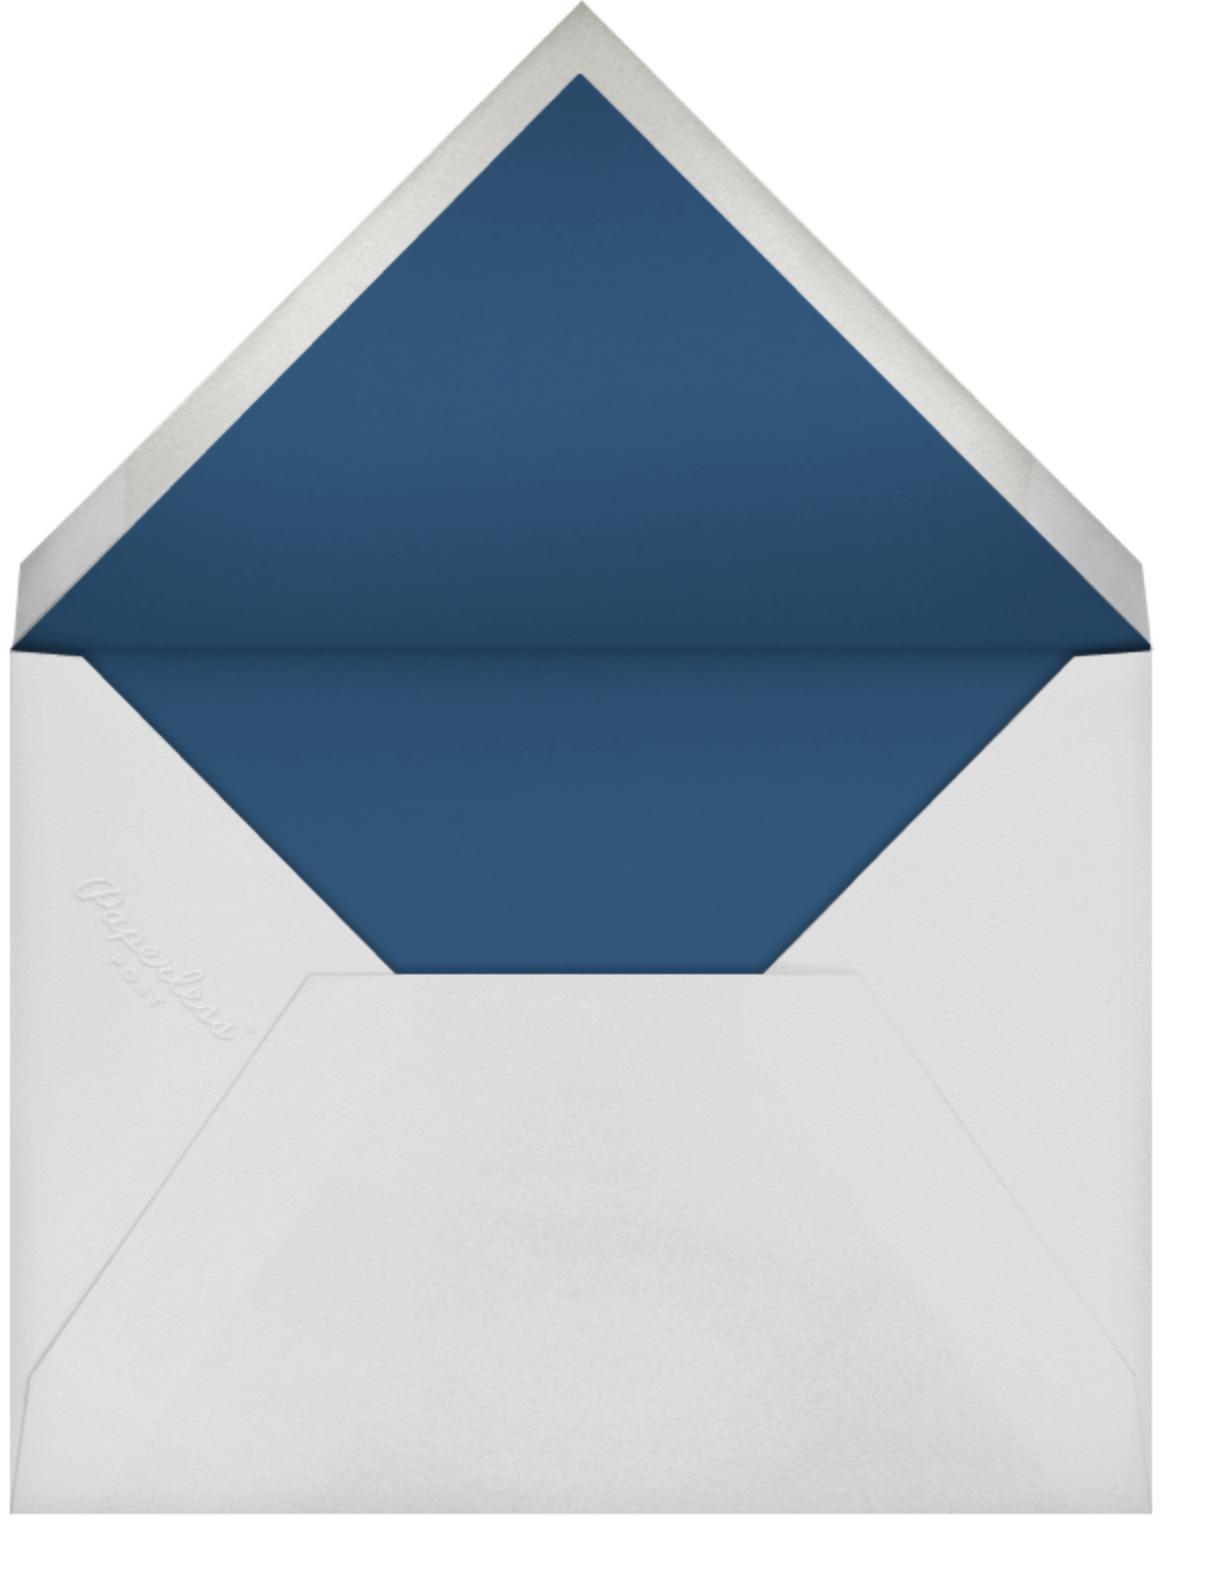 Gardenia (Save the Date) - White/Silver - Oscar de la Renta - Save the date - envelope back